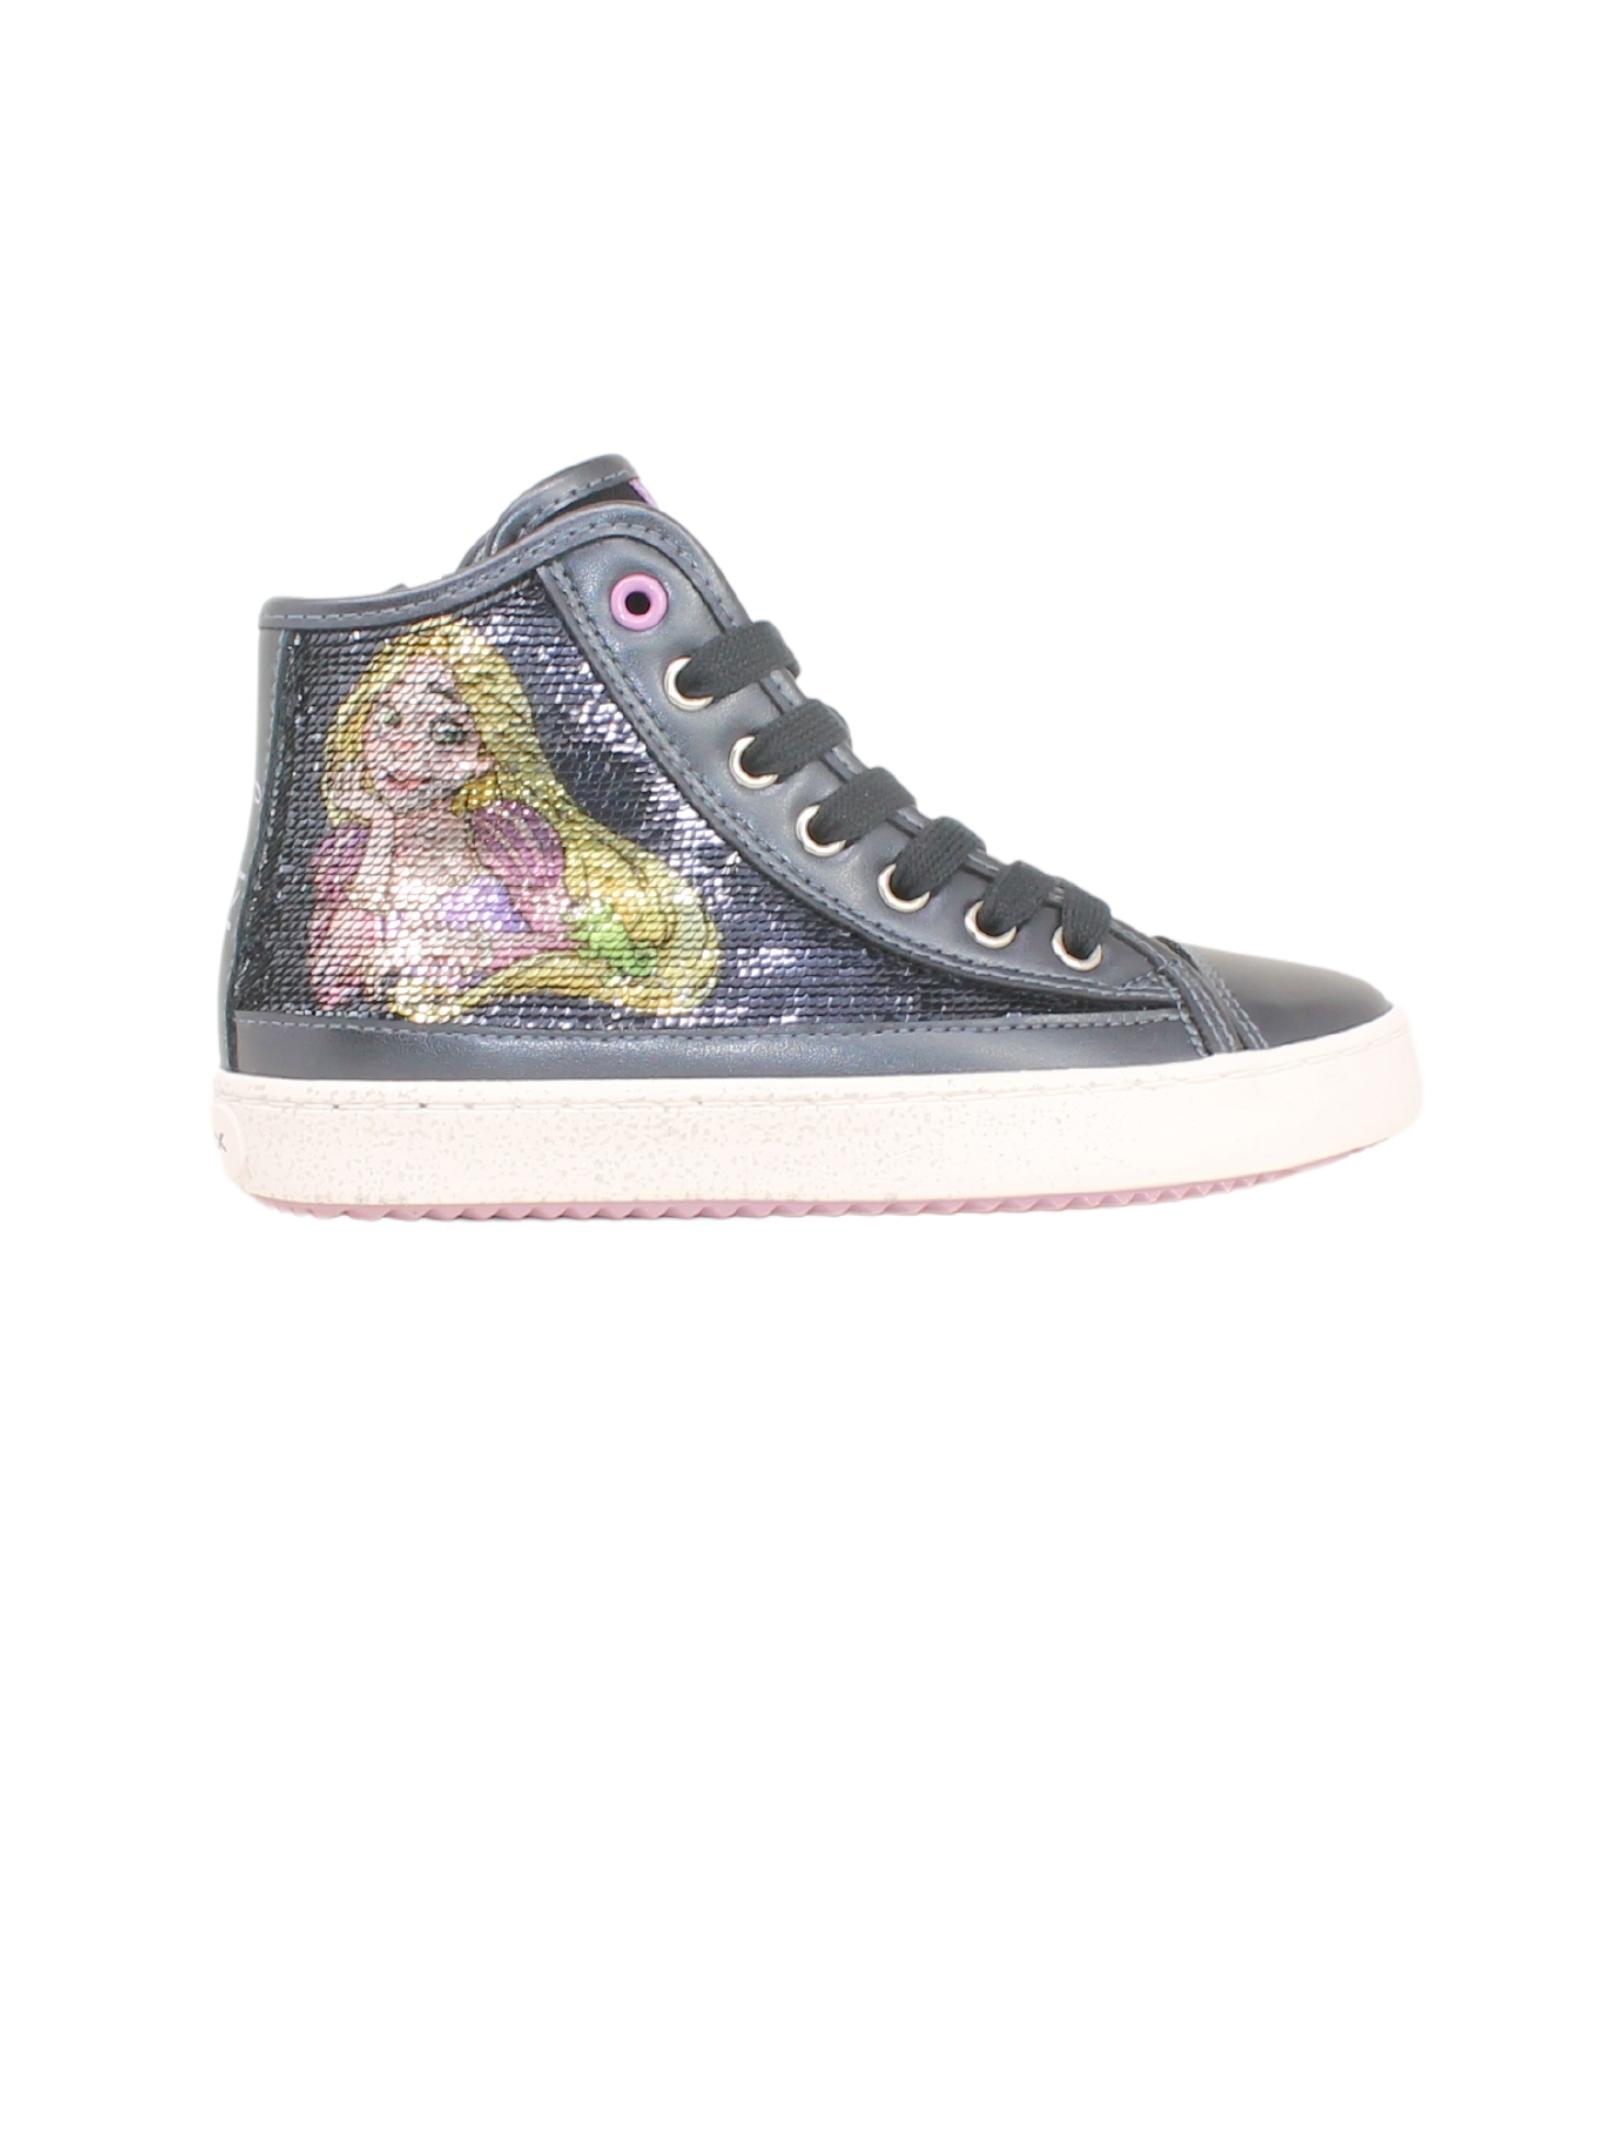 Sneakers Principessa Paillettes Bambina GEOX KIDS   Sneakers   J164GD0K9NFC4002